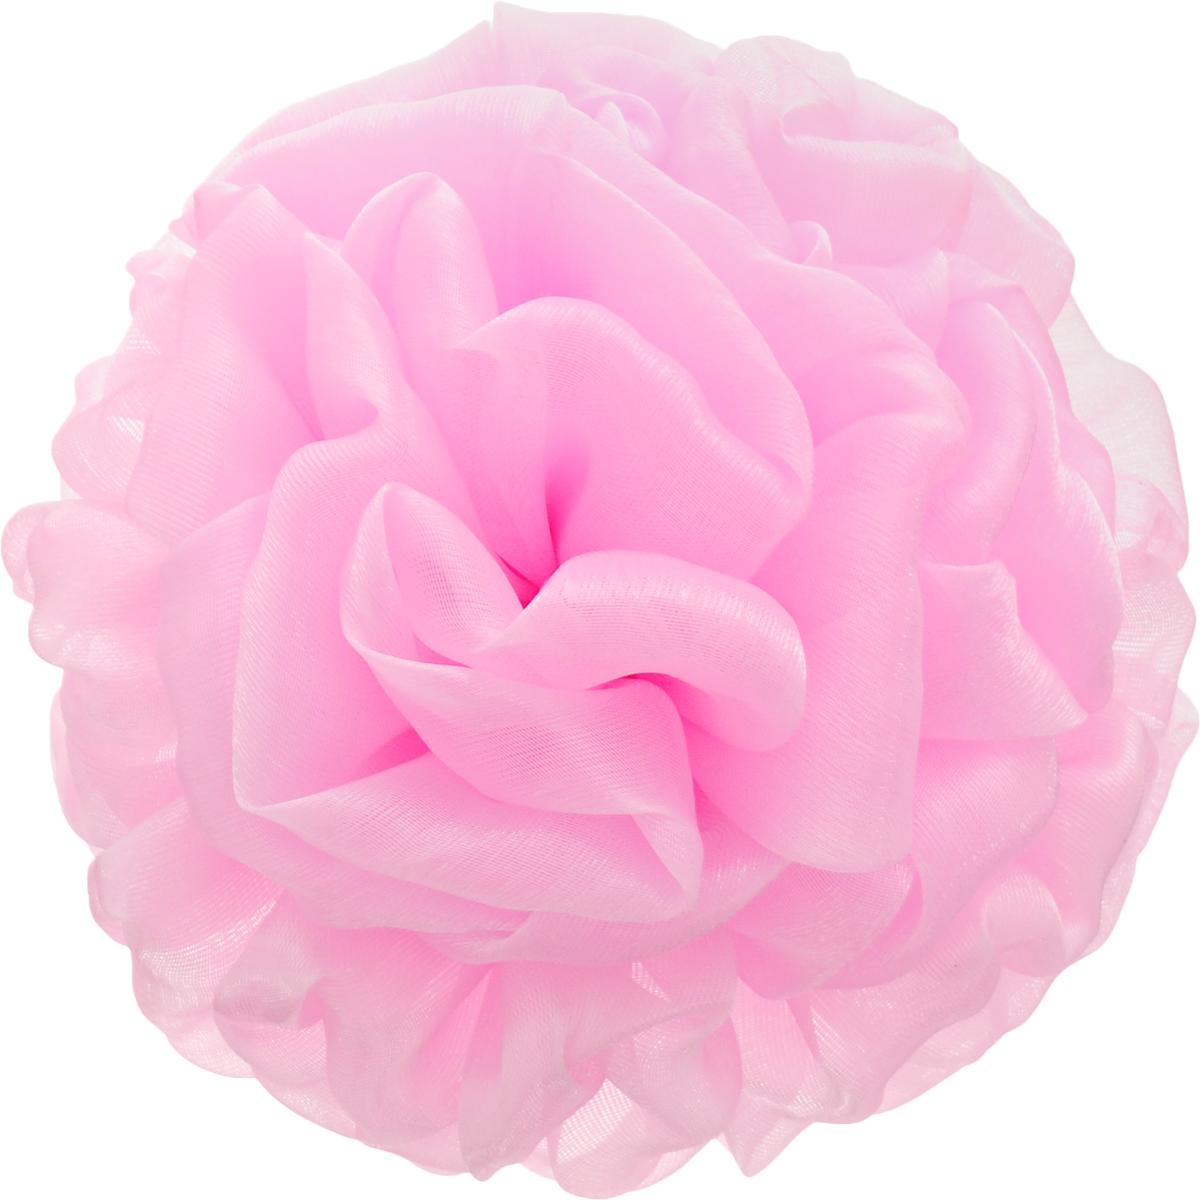 Baby's Joy Бант для волос цвет розовый MN 2 baby s joy резинка для волос цвет белый с бусинами mn 203